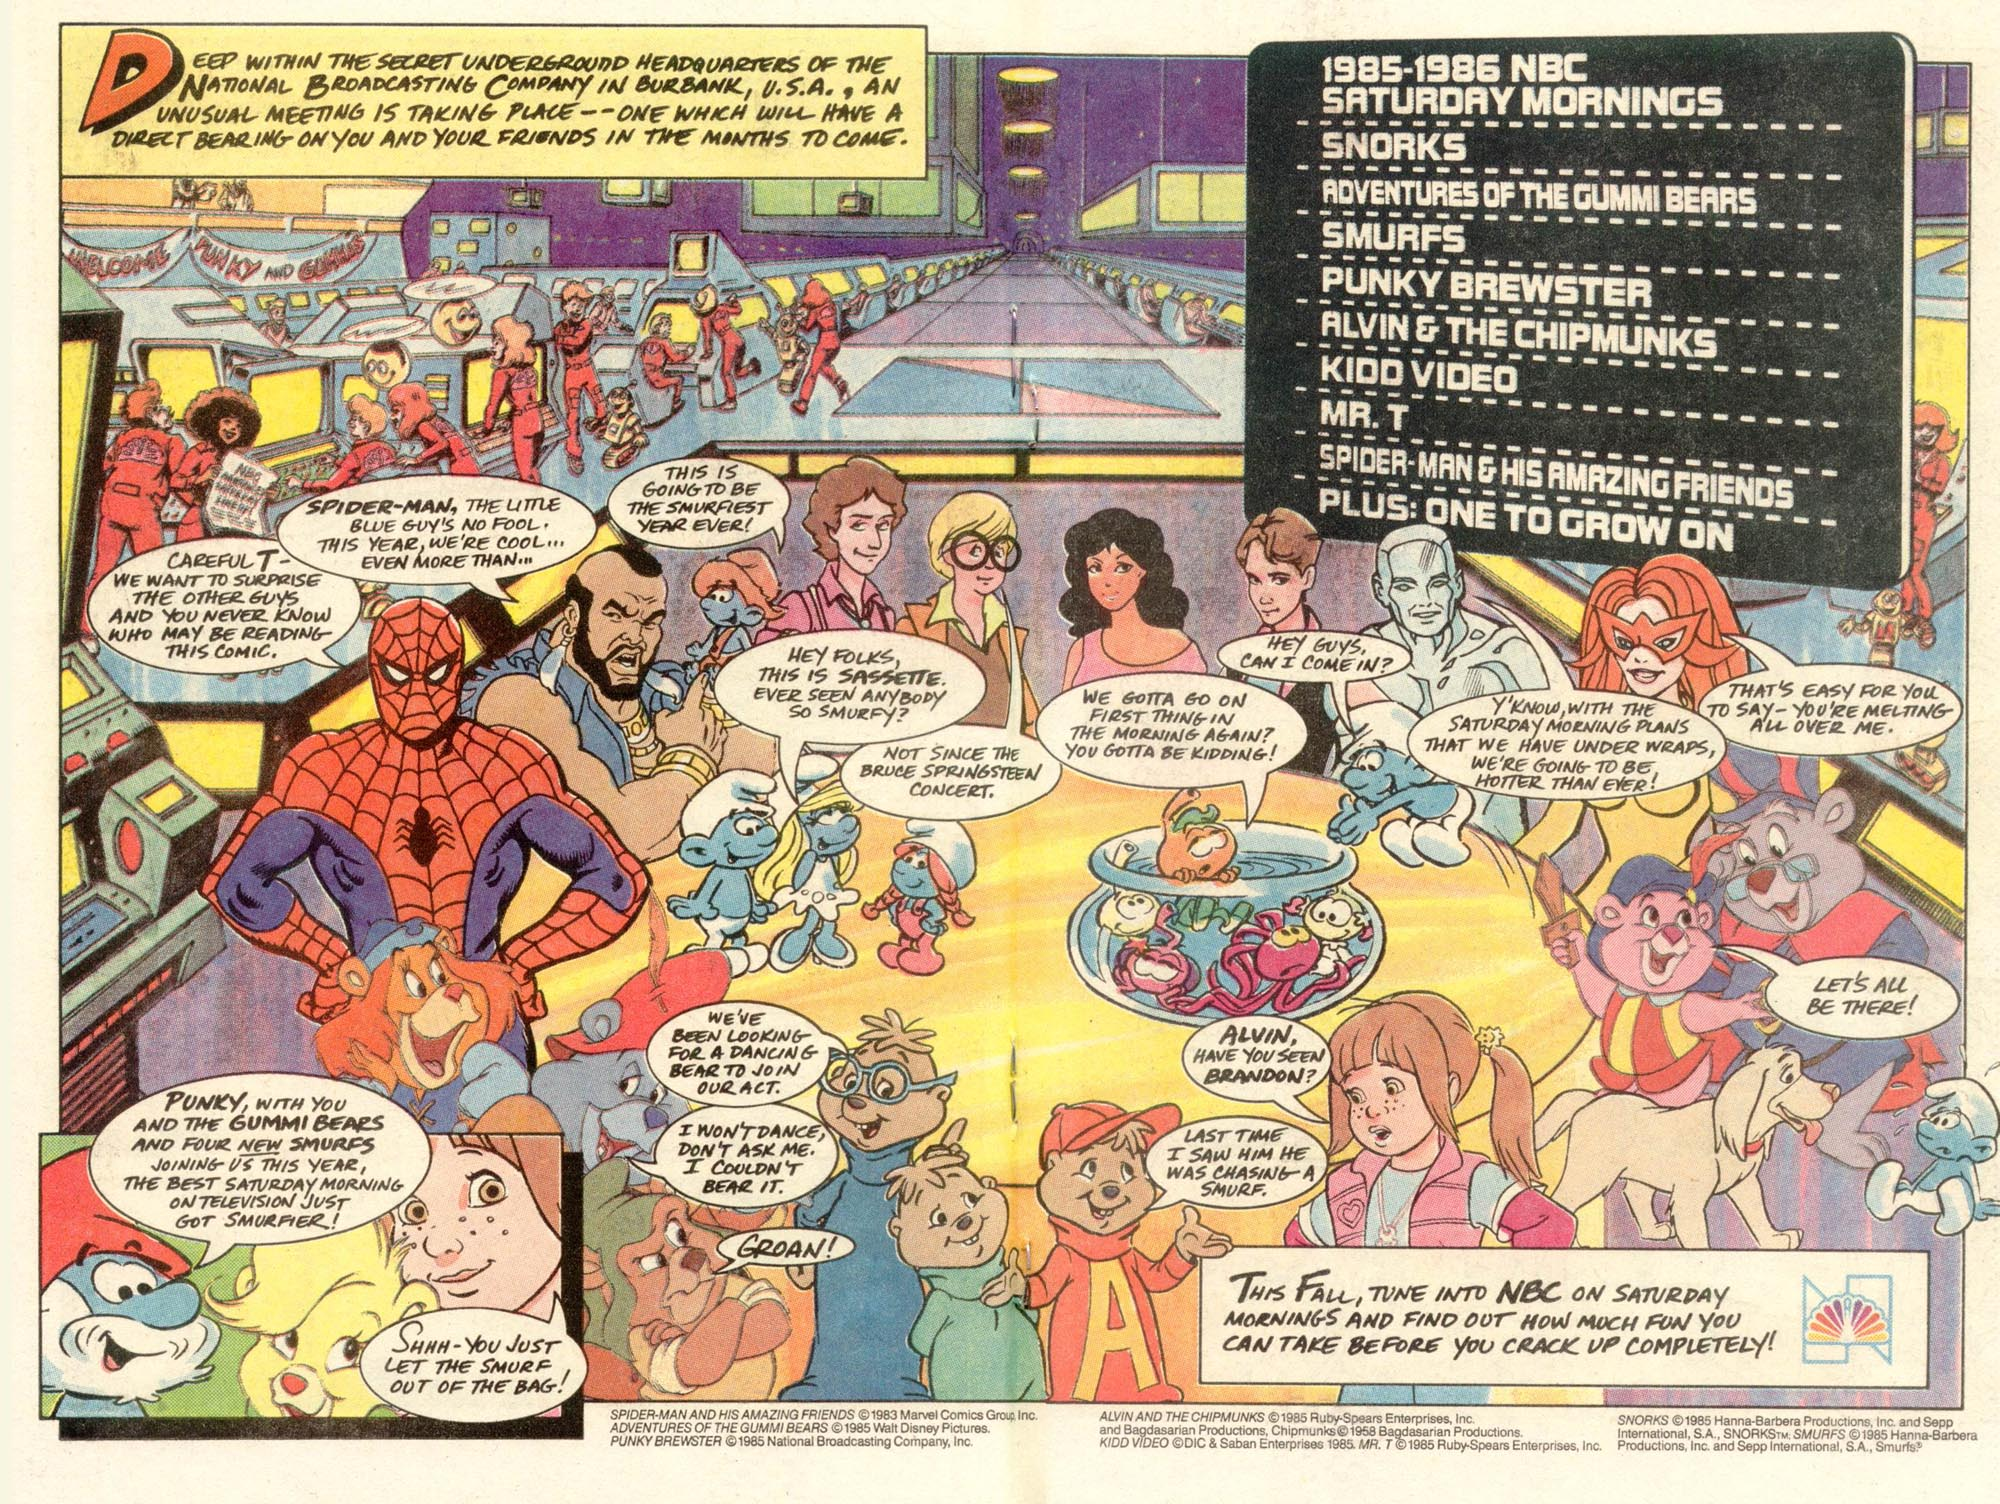 Read online Sergio Aragonés Groo the Wanderer comic -  Issue #10 - 13